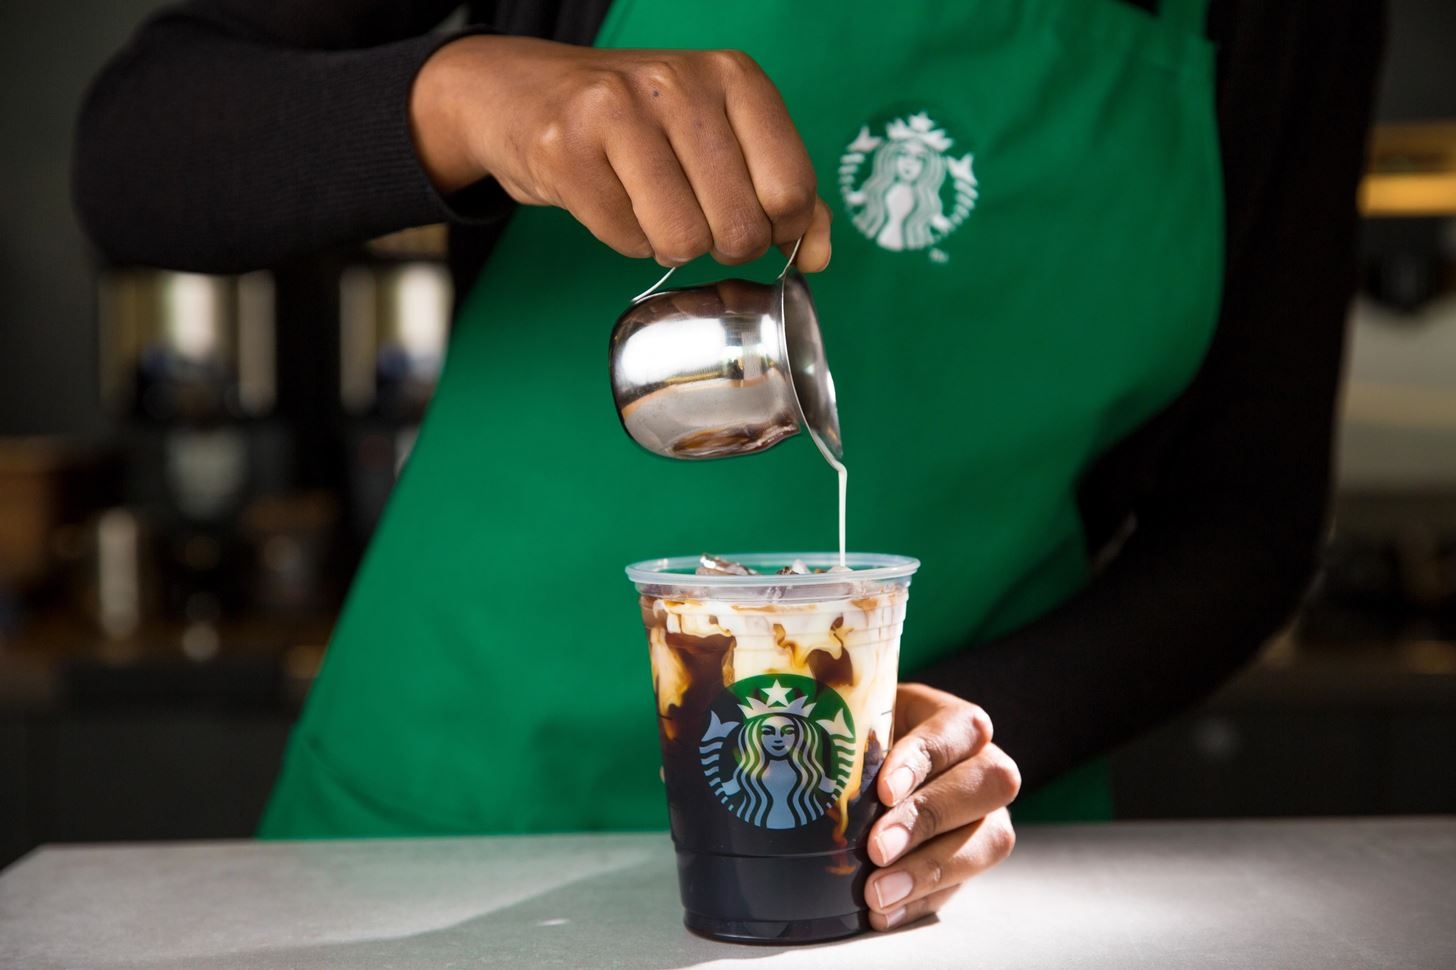 Skip the Line & Make Your Own Starbucks' Vanilla Sweet Cream Cold Brew